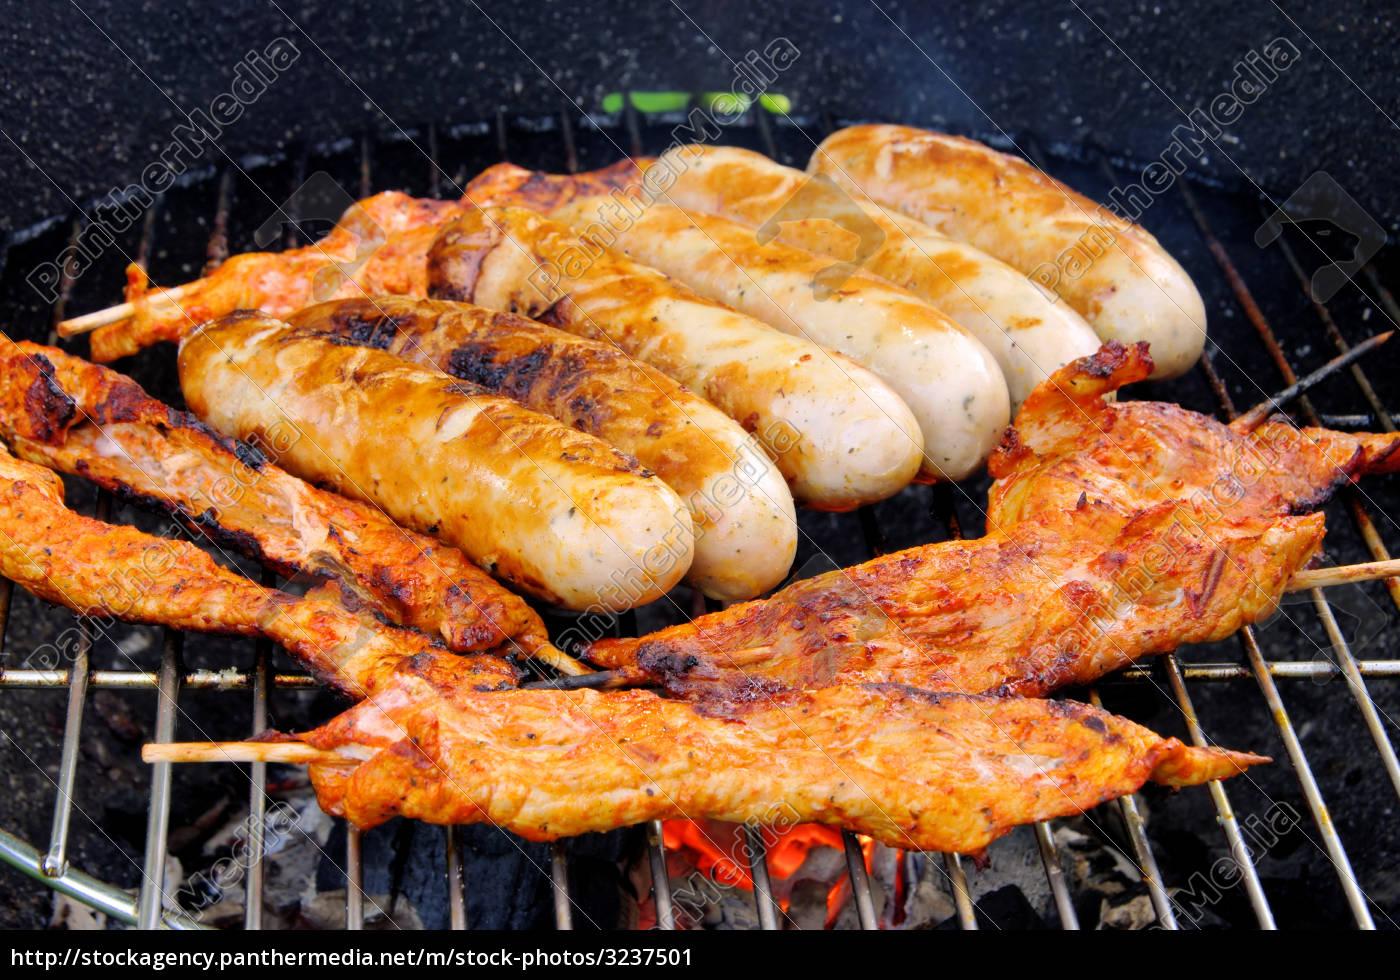 barbecue, bratwurst, -, barbecue, bratwurst, 09 - 3237501